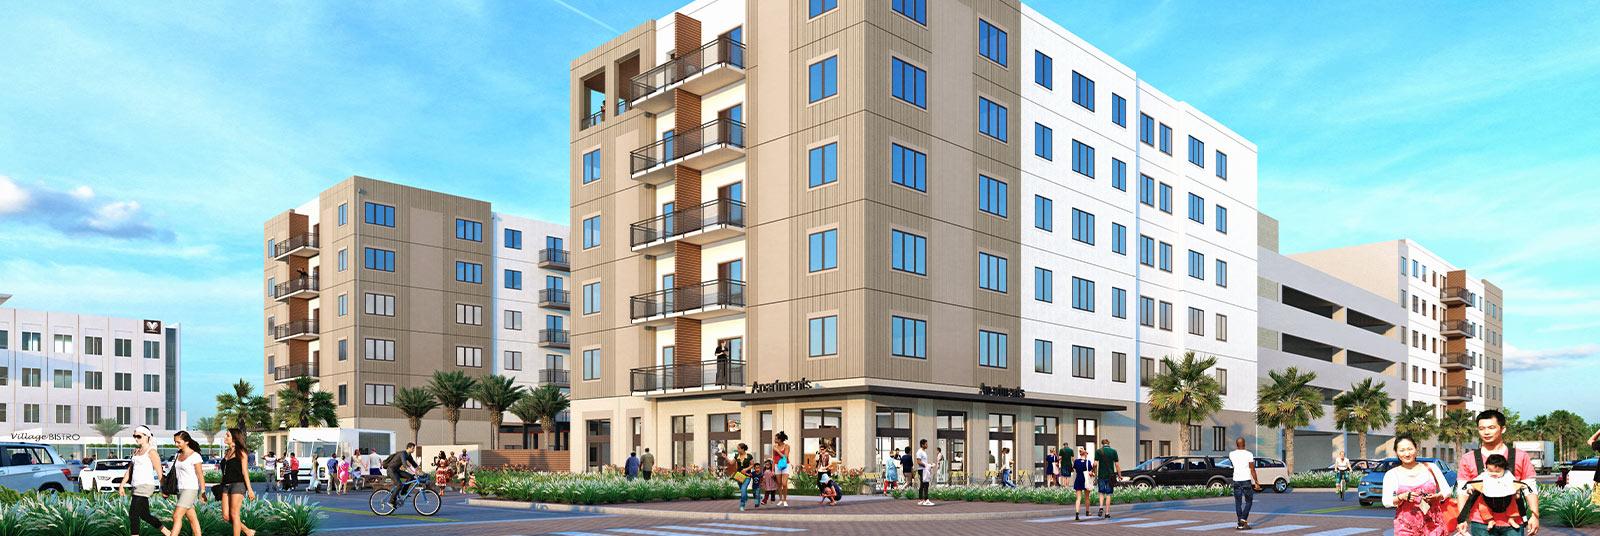 Rendering of the Luna ApartmentsRendering of the Luna Apartments